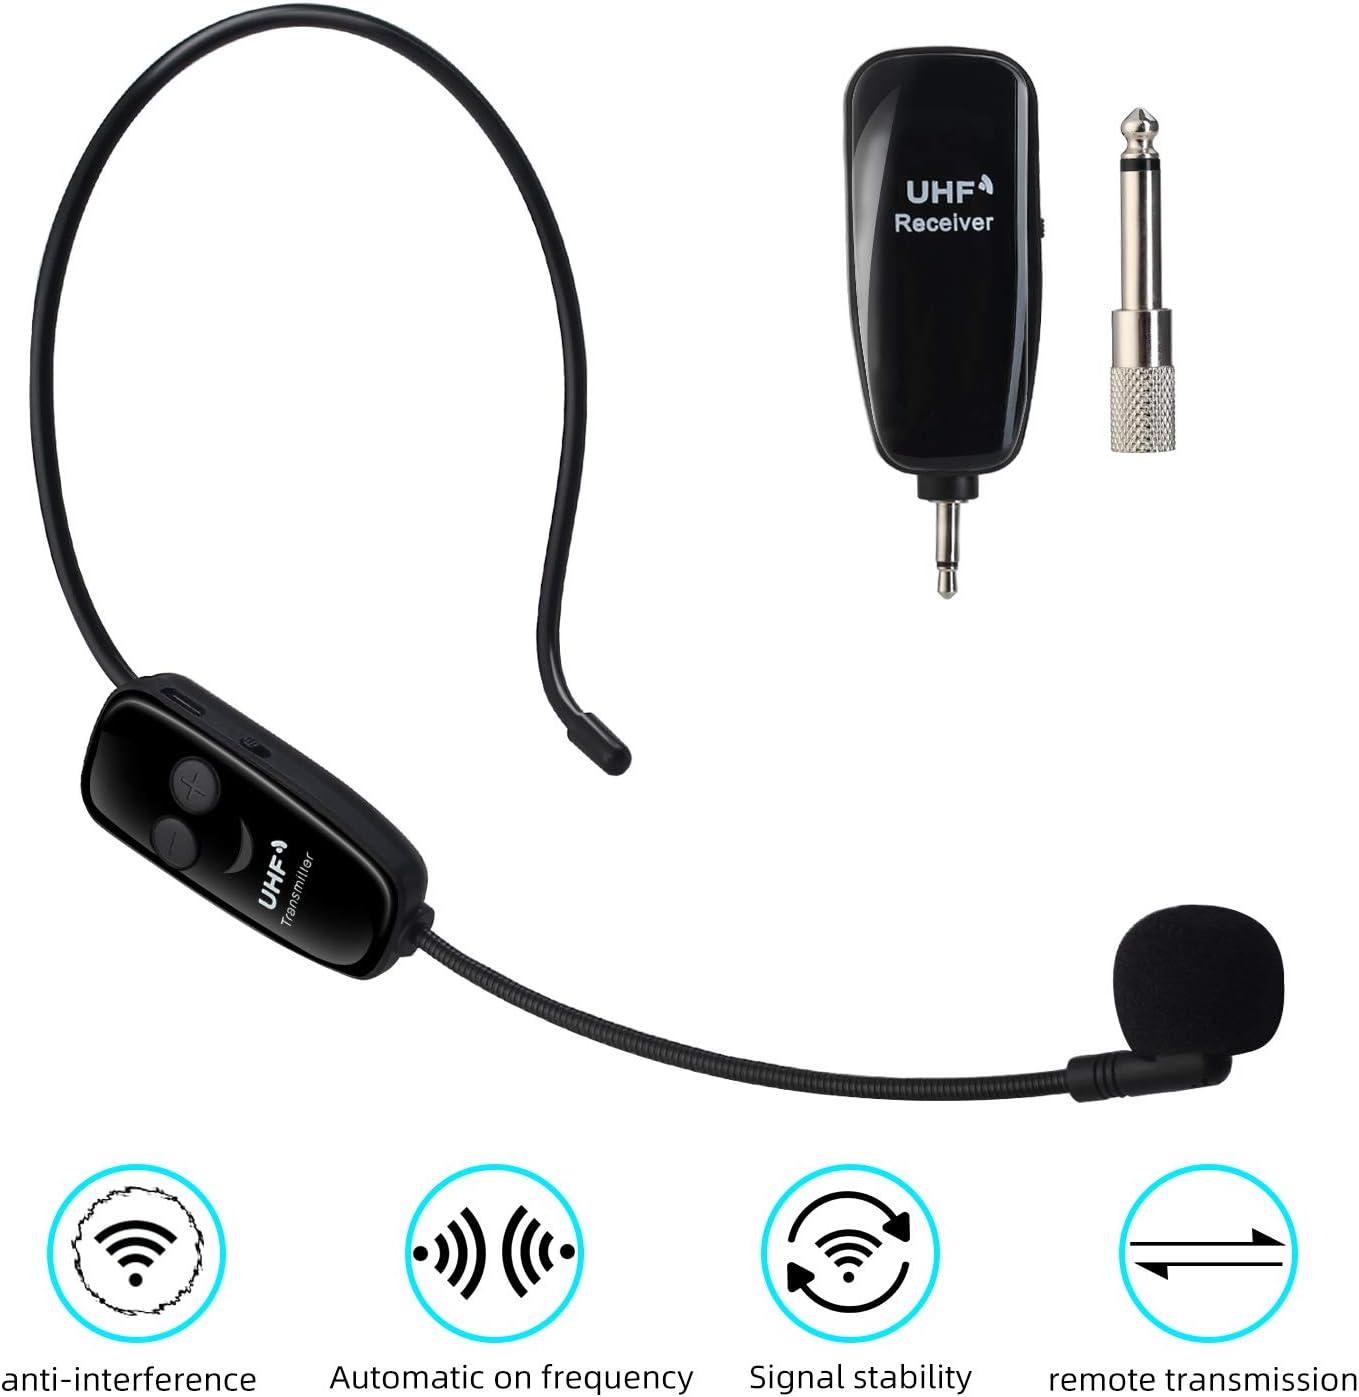 PELLOR UHF Micrófono Inalámbrico con Diadema, Micrófono Inalámbrico 2 en 1 para Amplificador de Voz, Transmisión Inalámbrica Estable 50m, Ideal para Ayuda Turístico,Rendimiento,Discurso